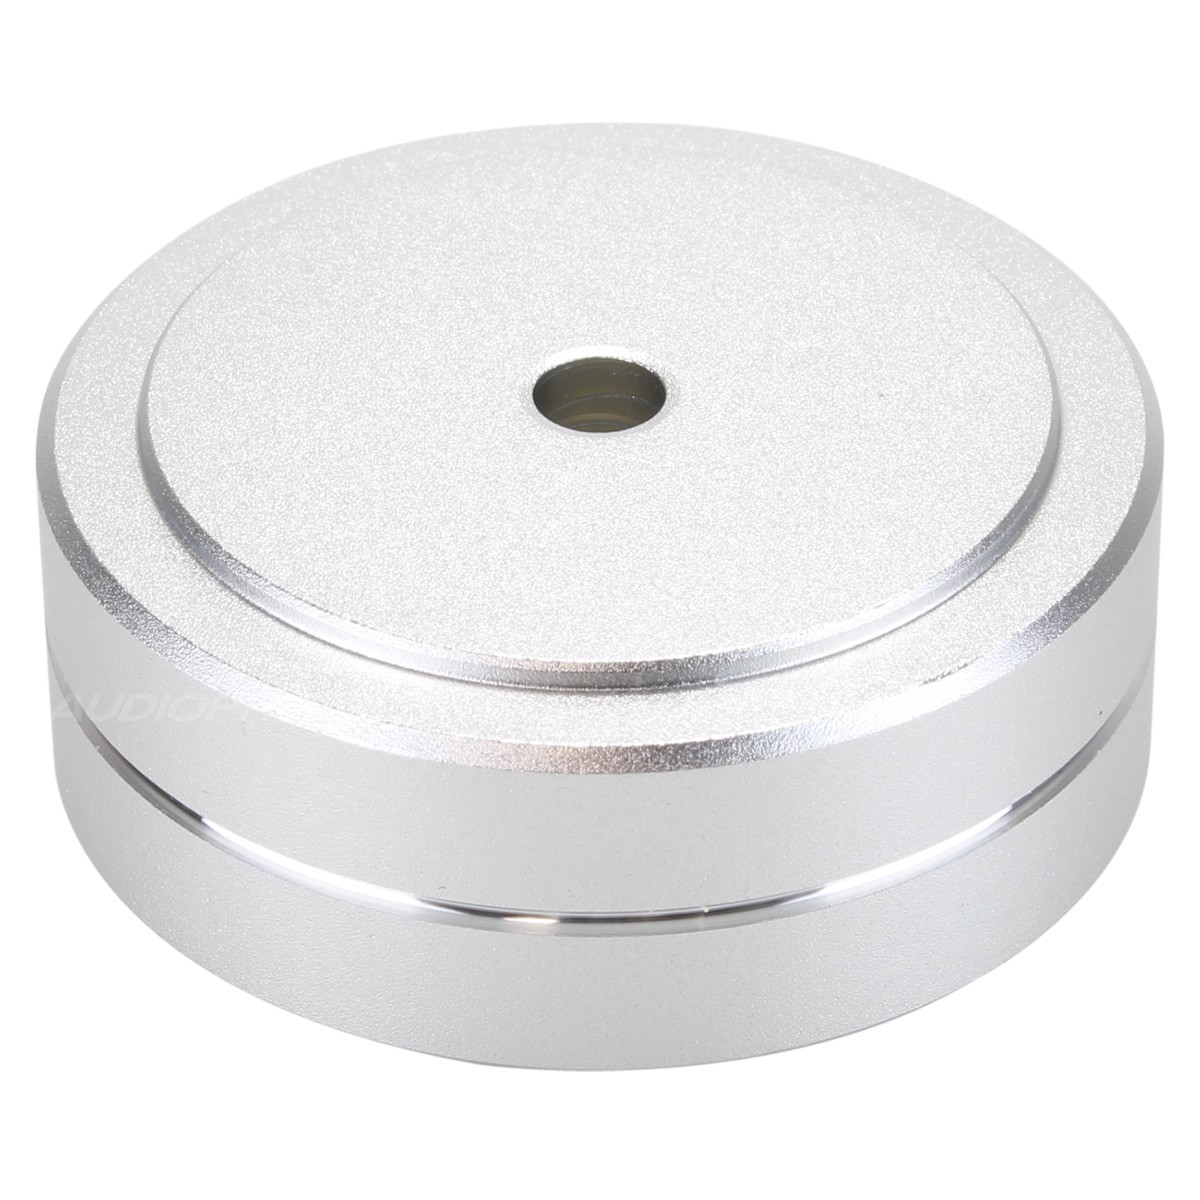 Aluminium damping feet Silver 40x15mm M4.5 (Unité)